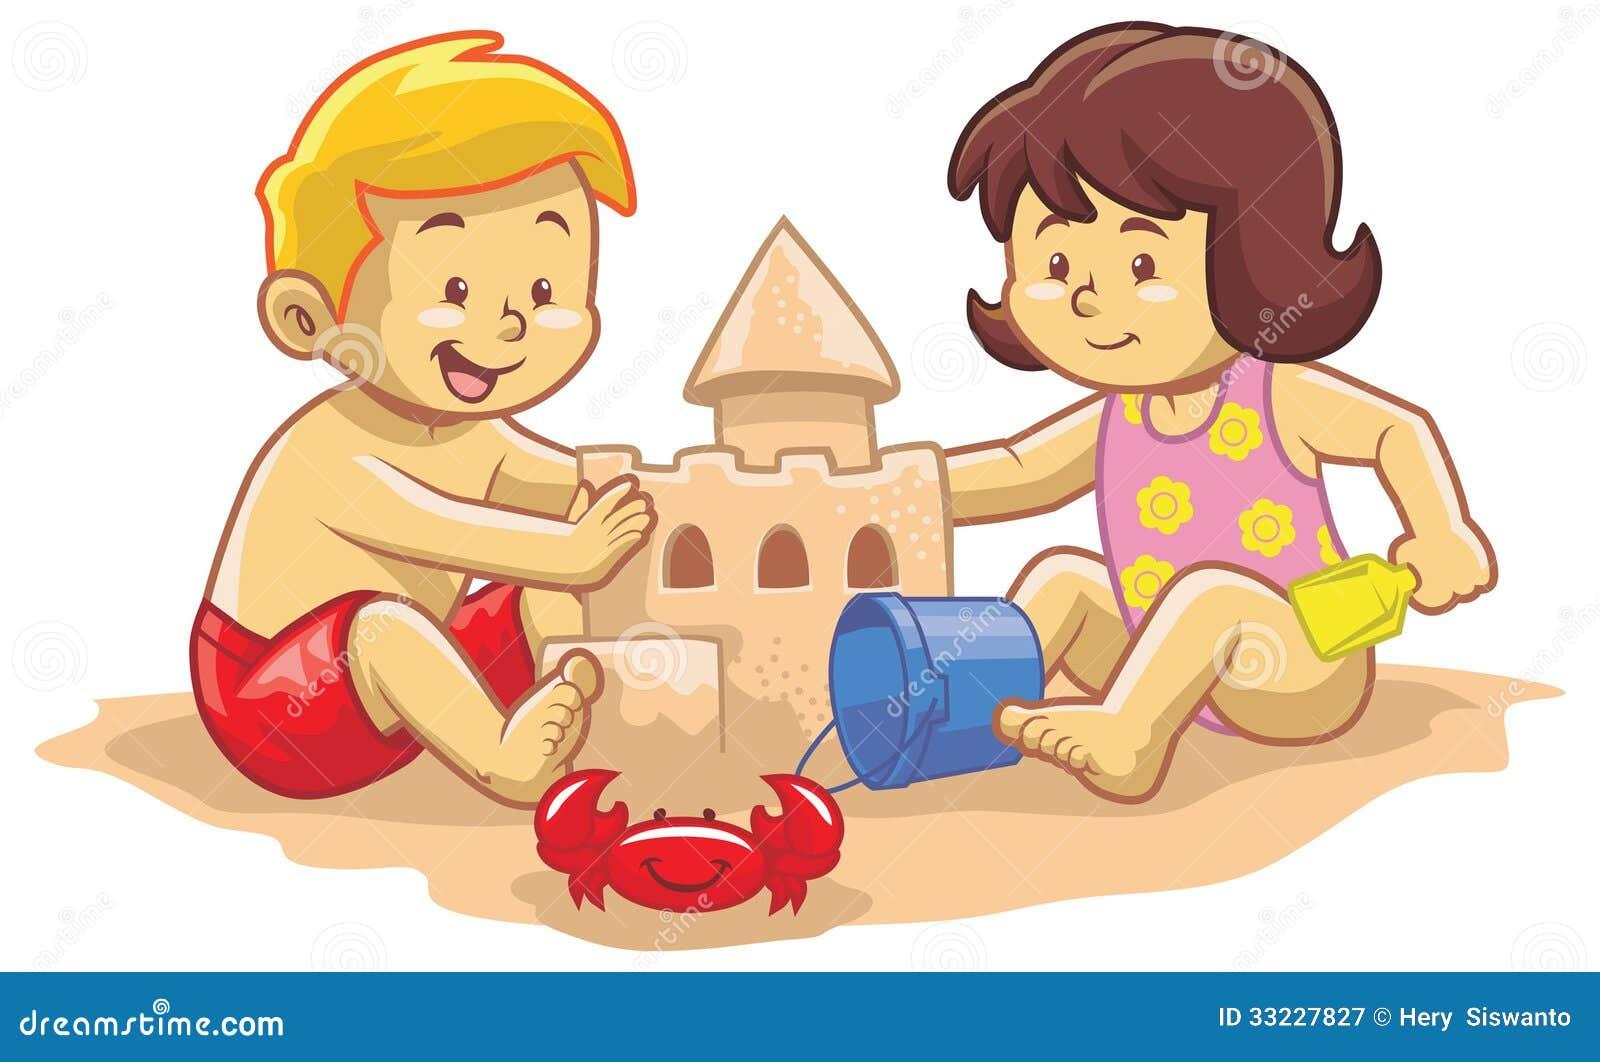 kids build sand castle royalty free stock photography image 33227827 clipart nurse logos clip art nurses cap